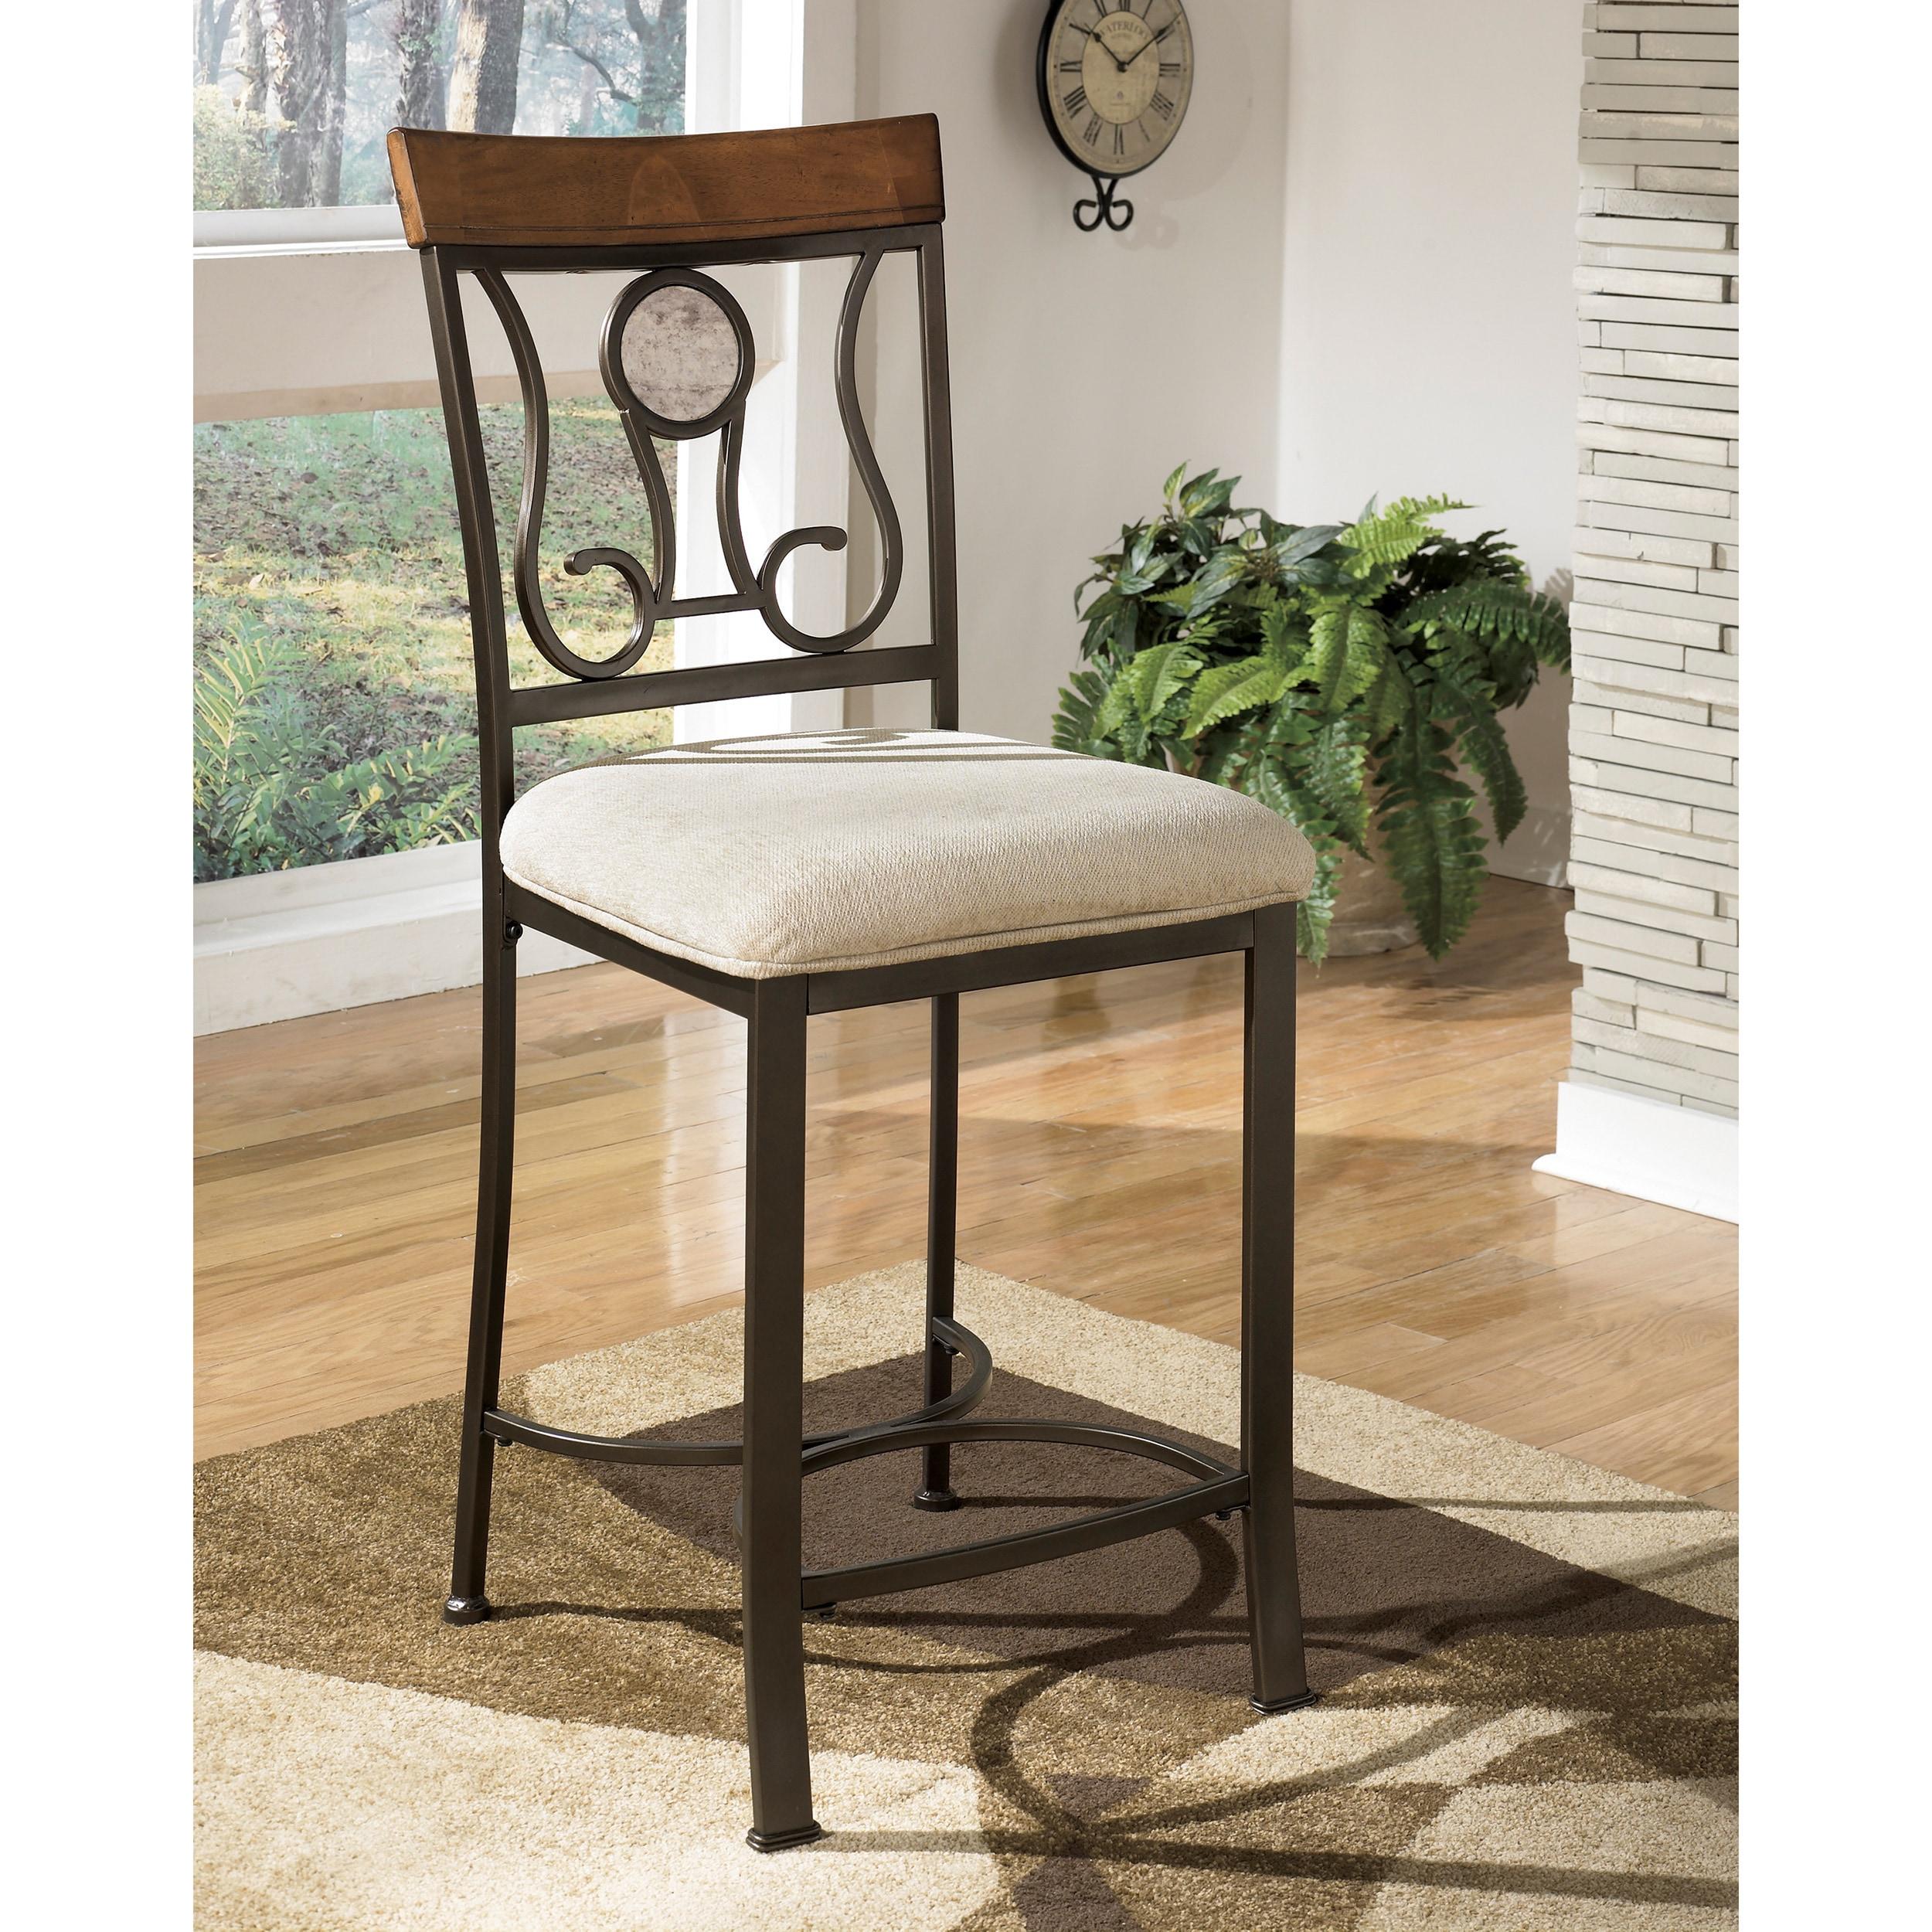 stools large view shelter stool backless of brown set bar cushion image rectangular rectangle